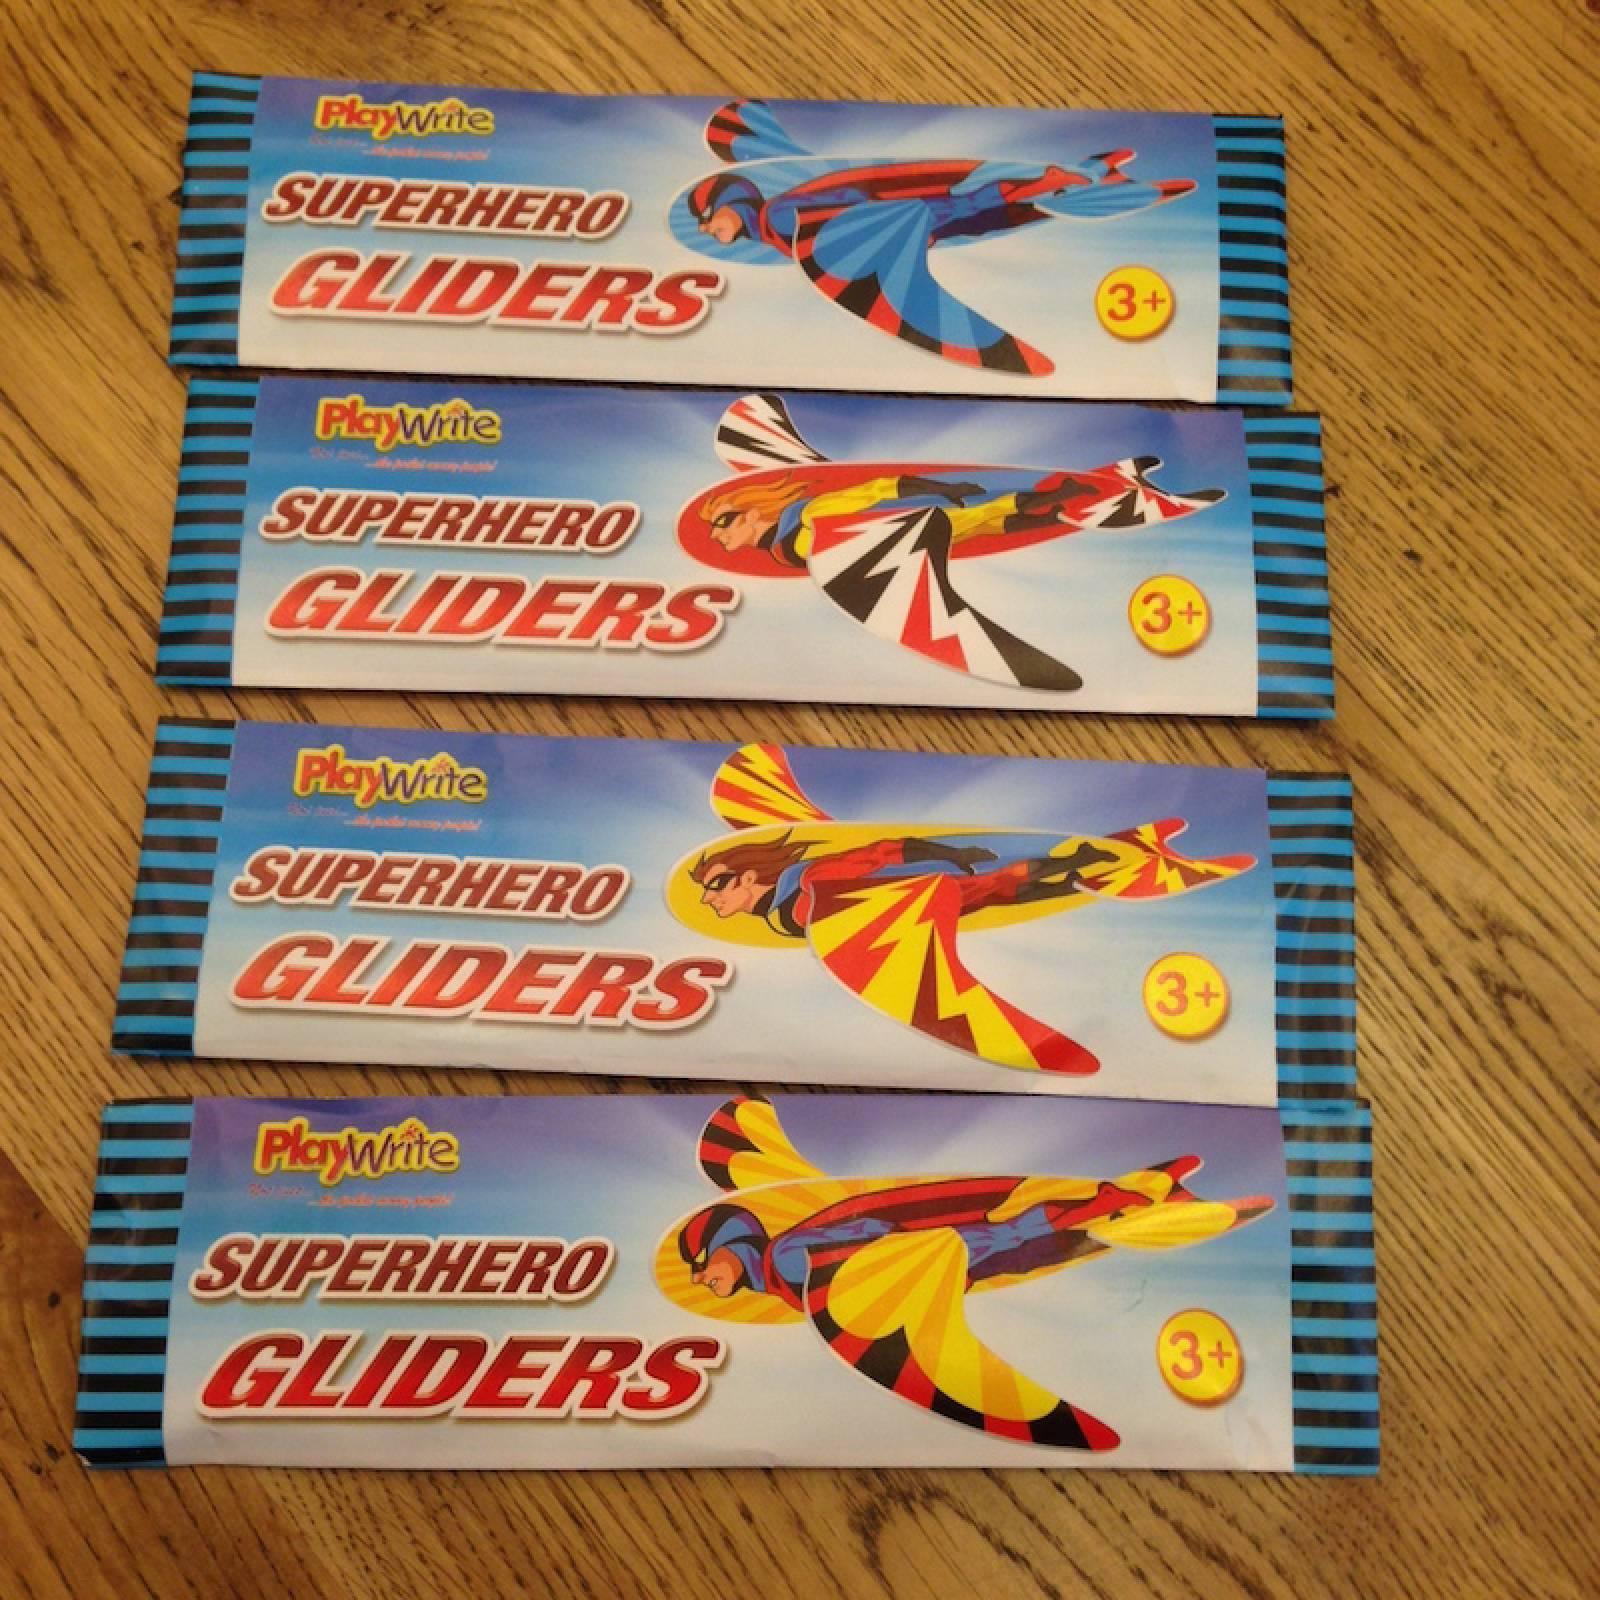 Superhero Glider 3yr+ thumbnails